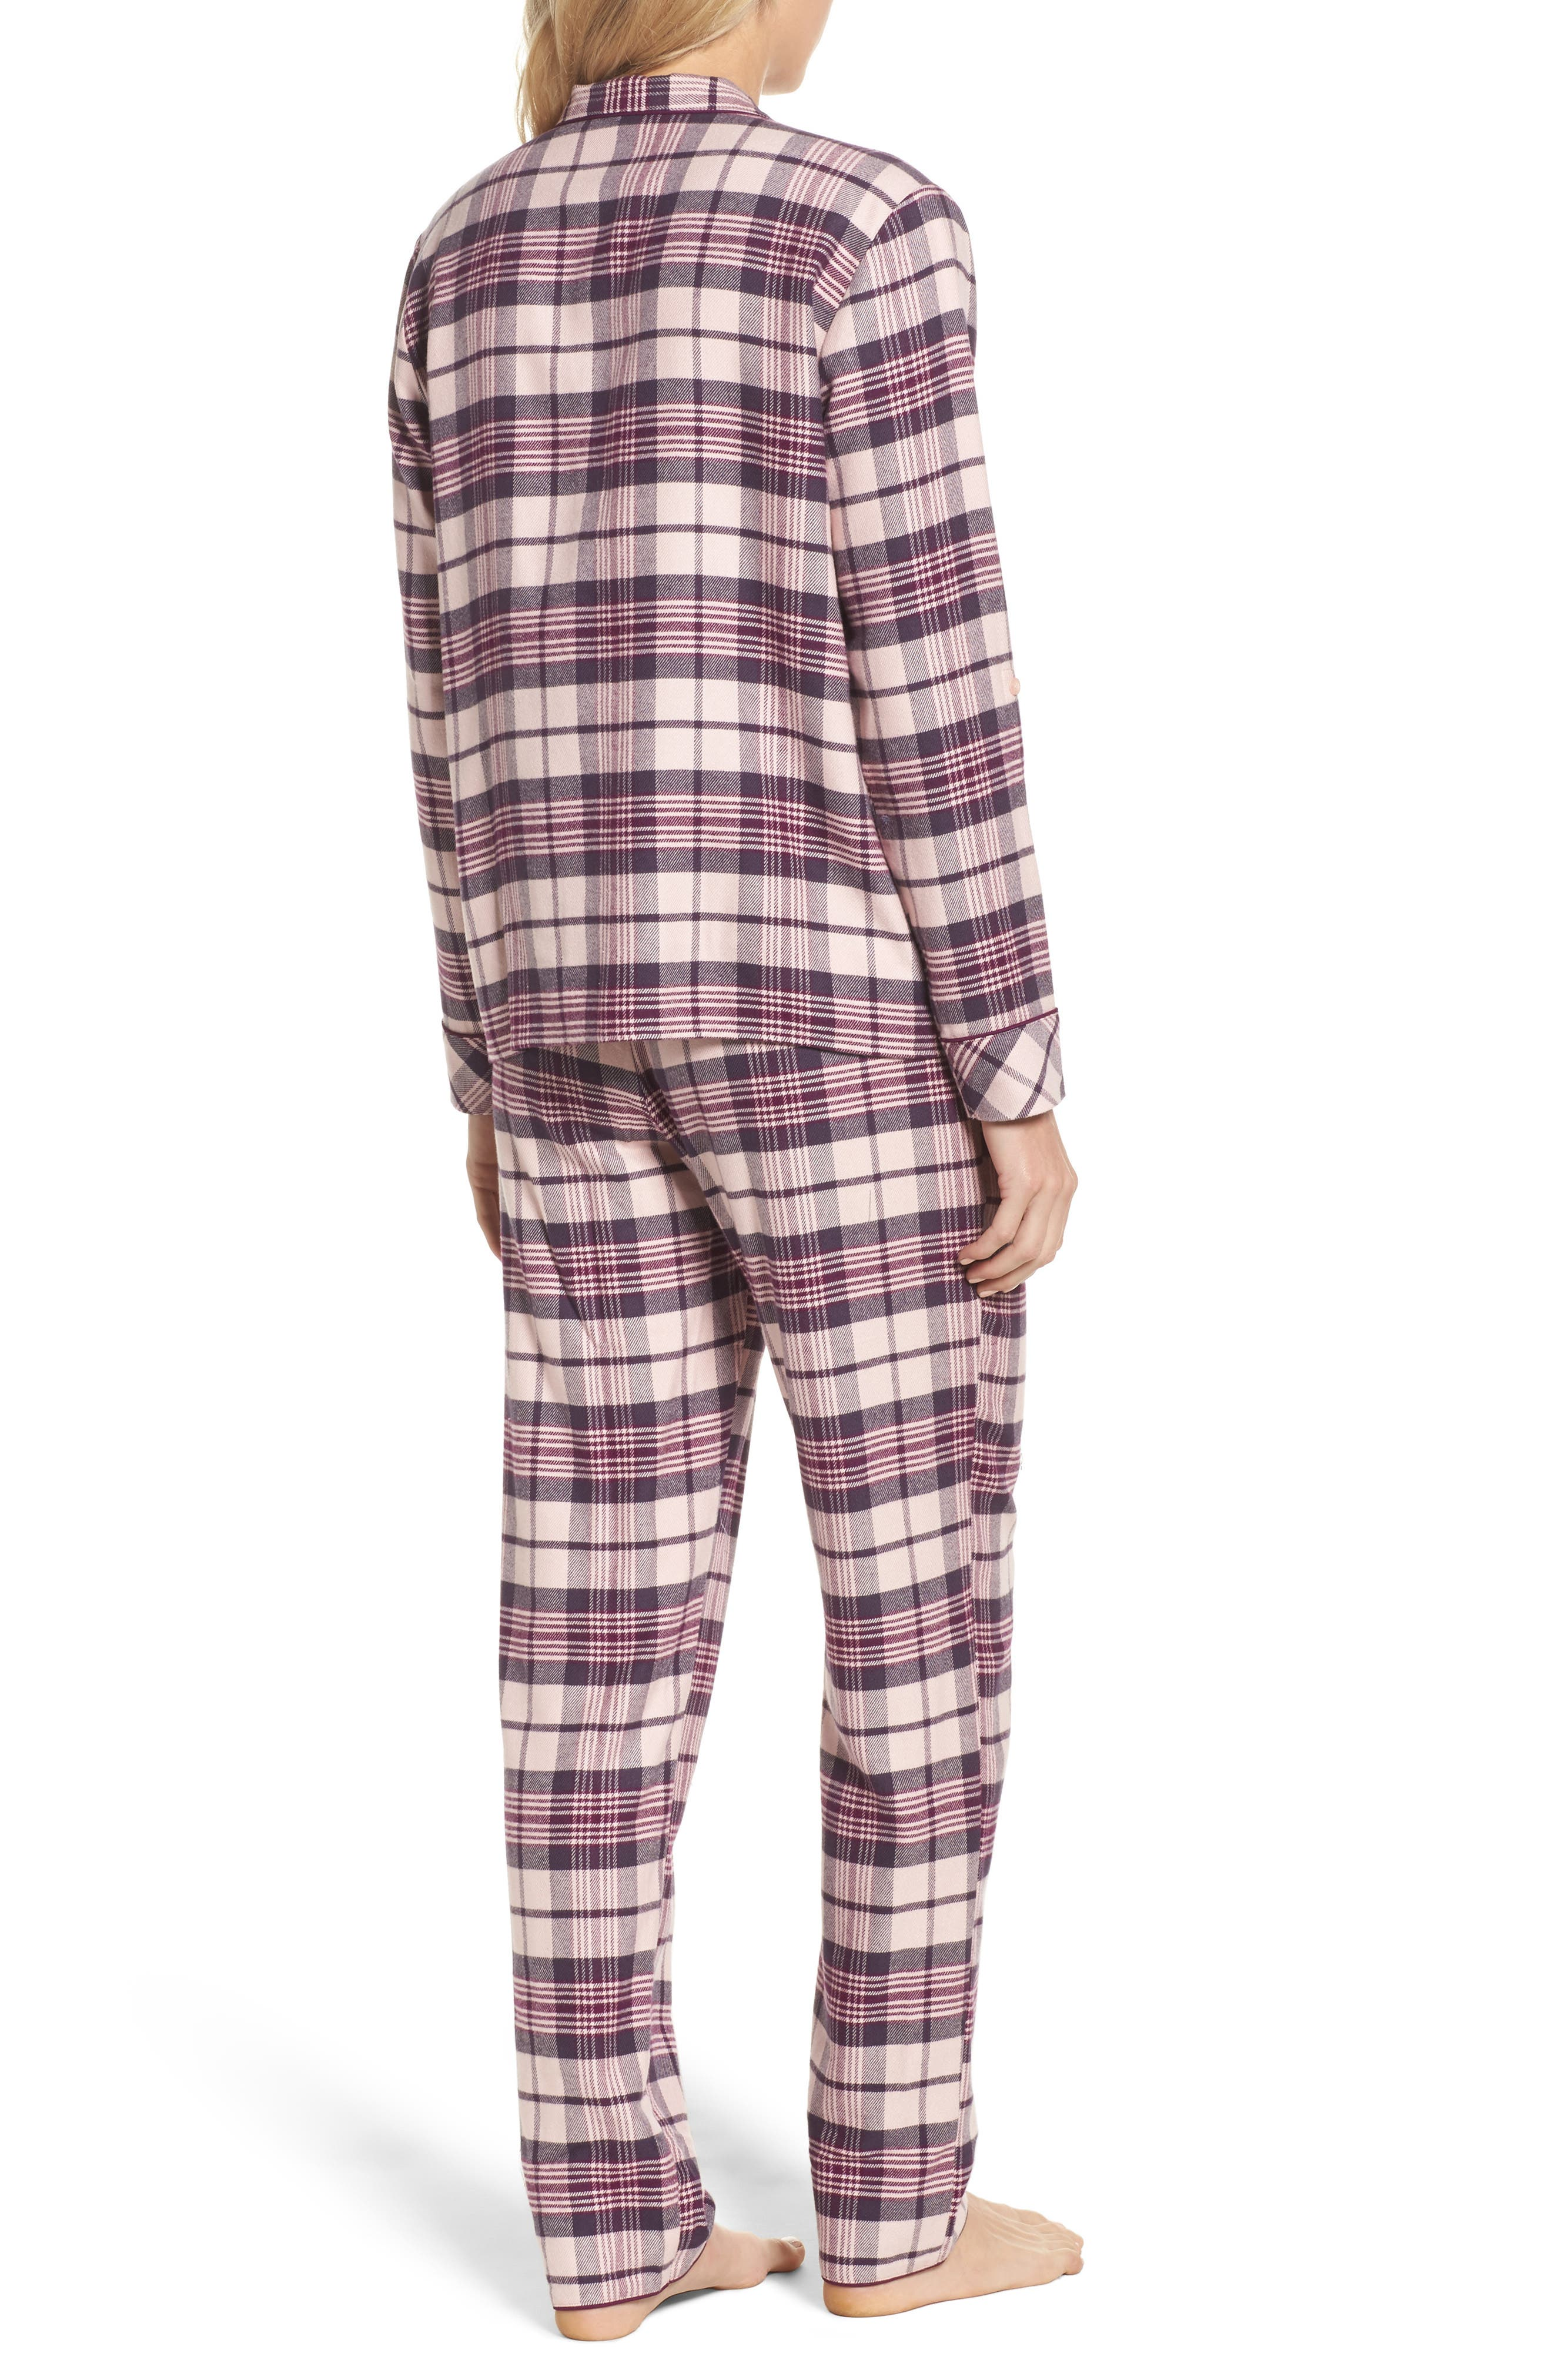 Lingerie Starlight Flannel Pajamas,                             Alternate thumbnail 10, color,